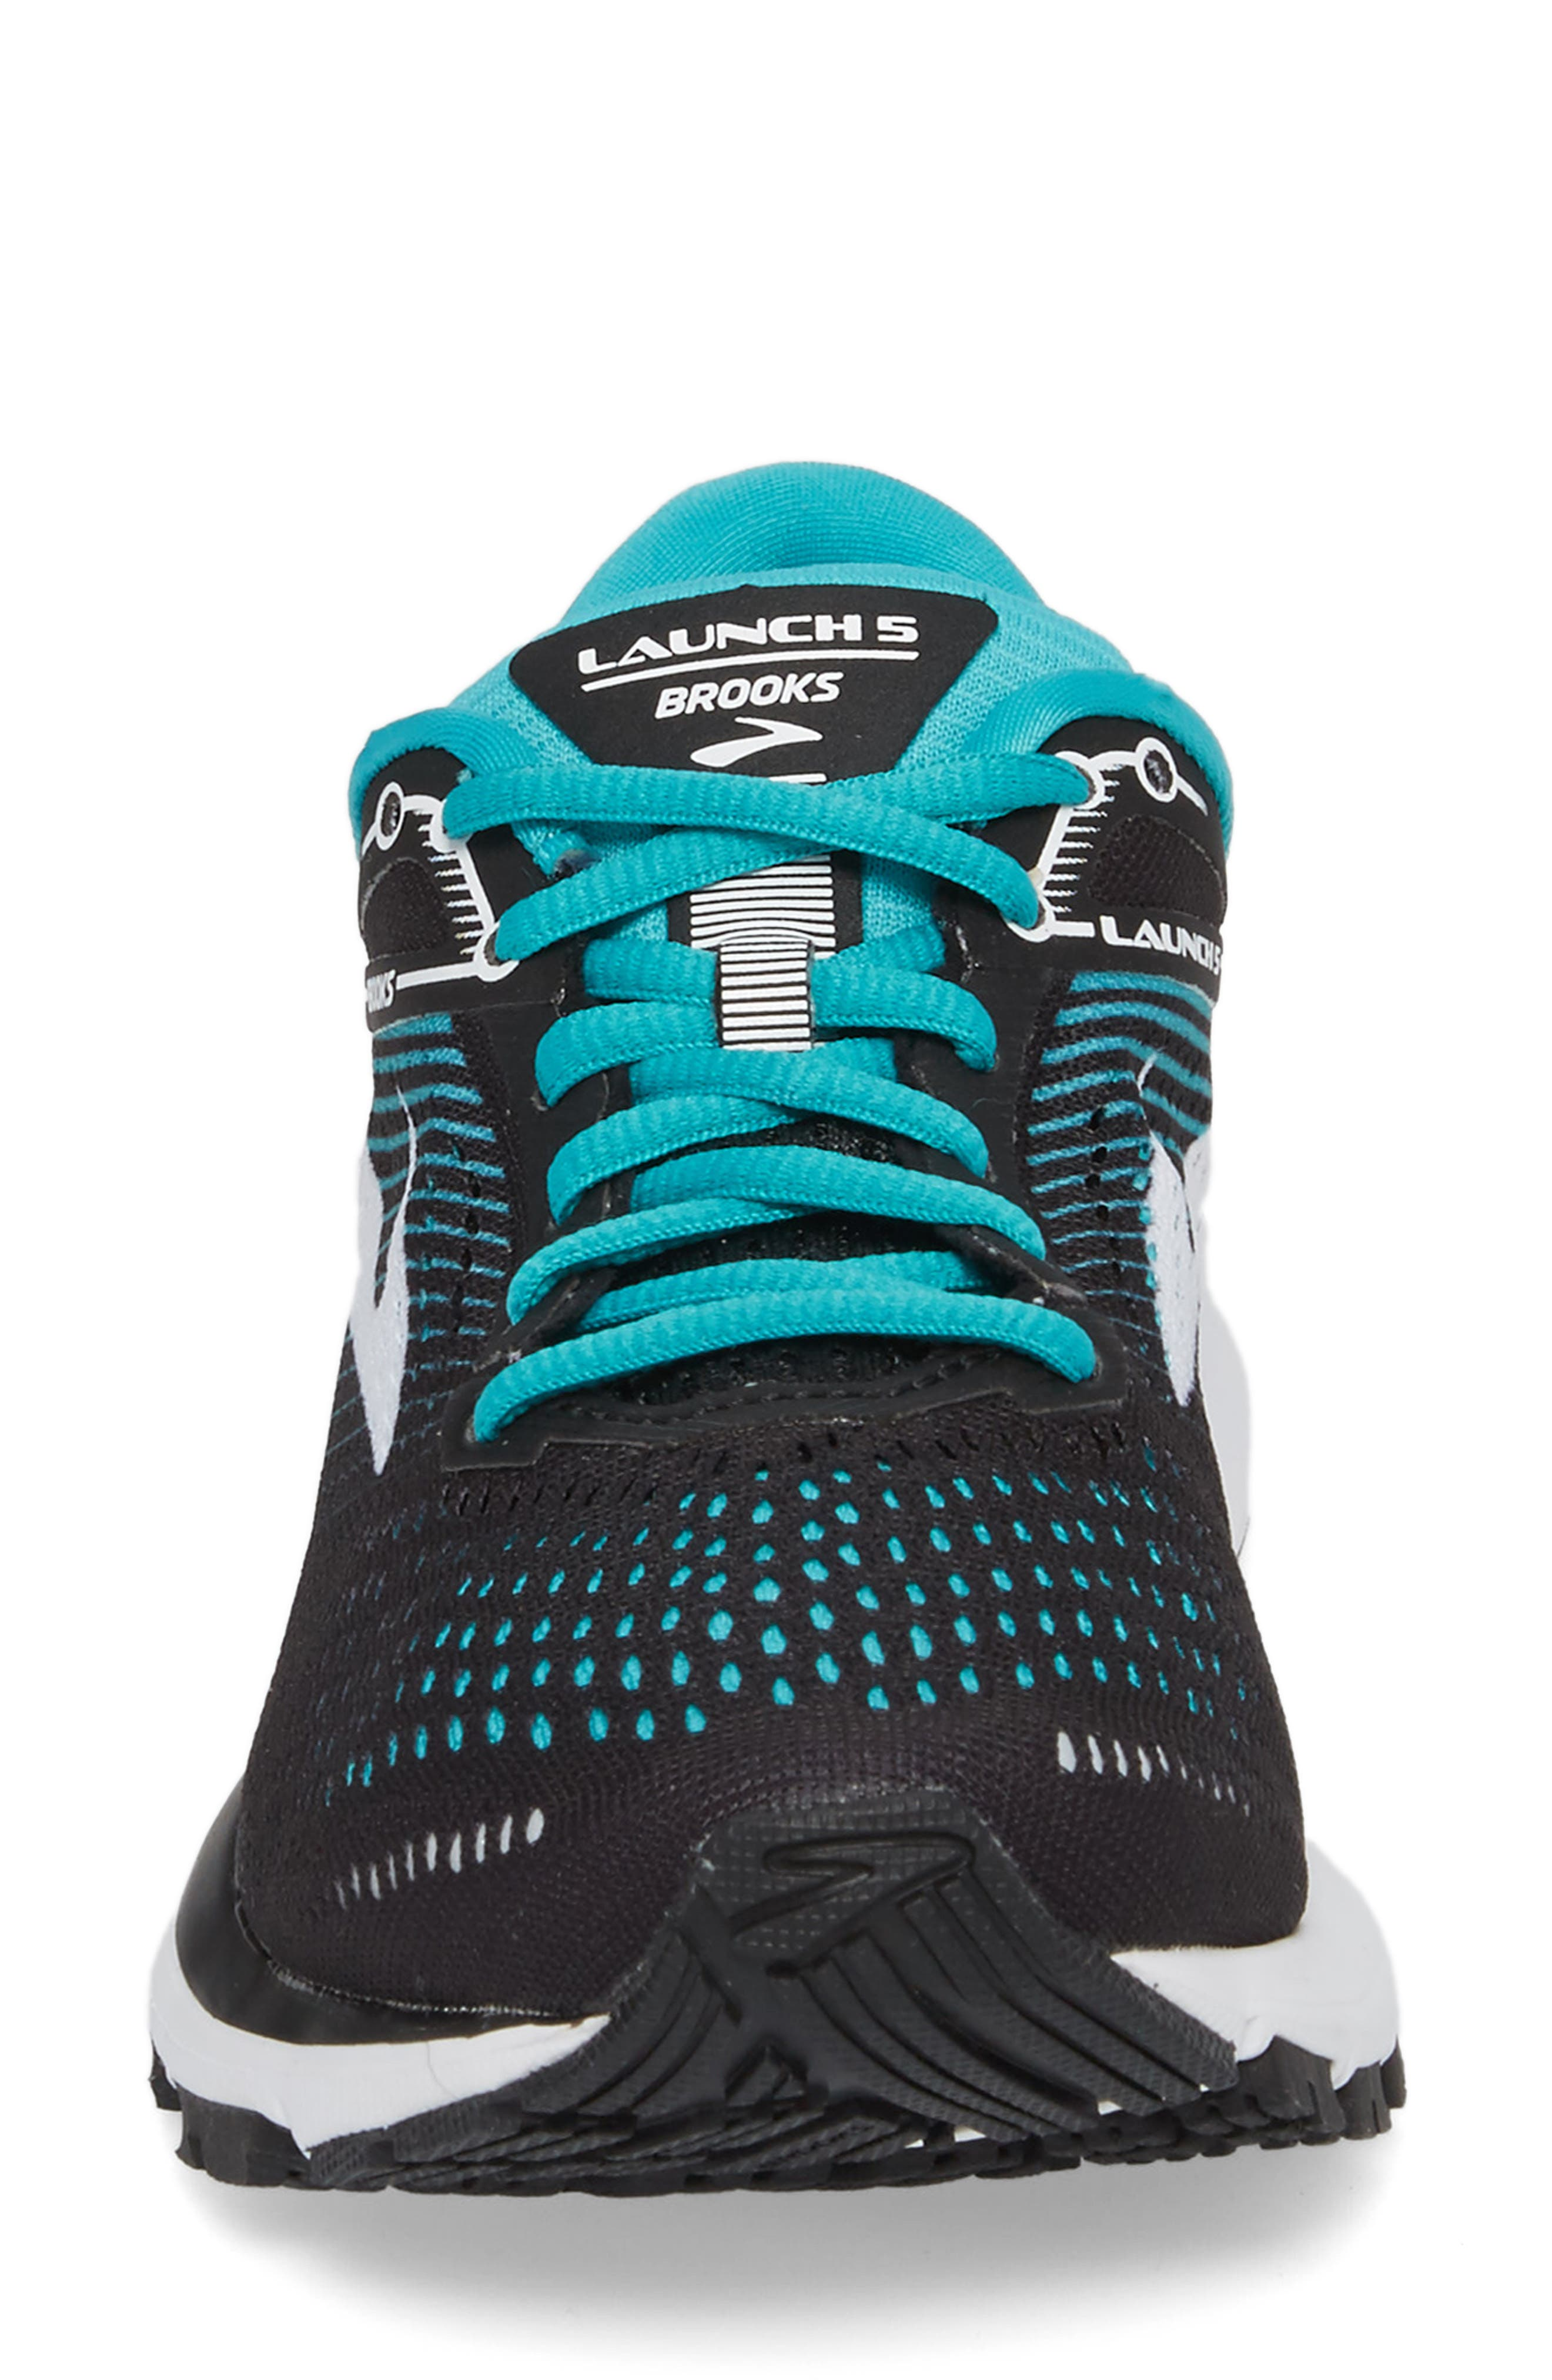 BROOKS,                             Launch 5 Running Shoe,                             Alternate thumbnail 4, color,                             BLACK/ TEAL GREEN/ WHITE